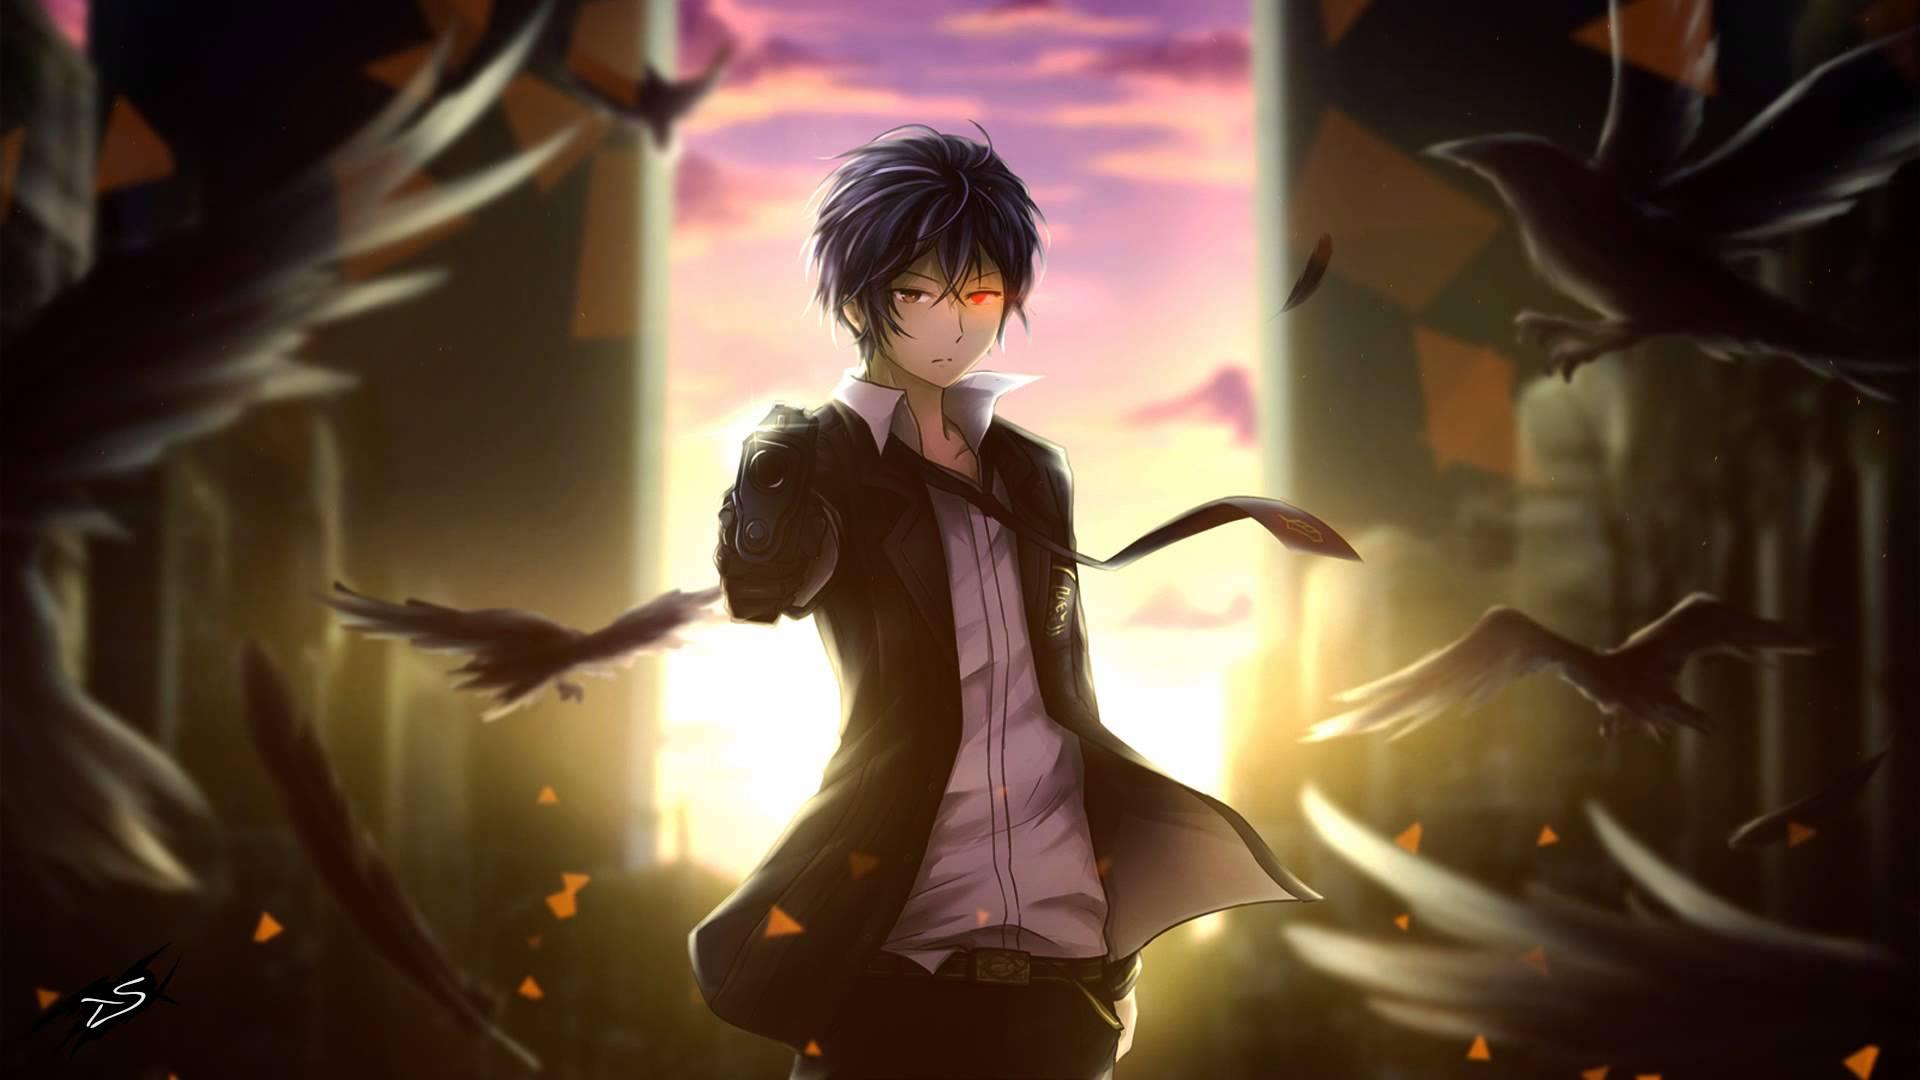 Hei, Darker than Black, anime, ravens, gun fire